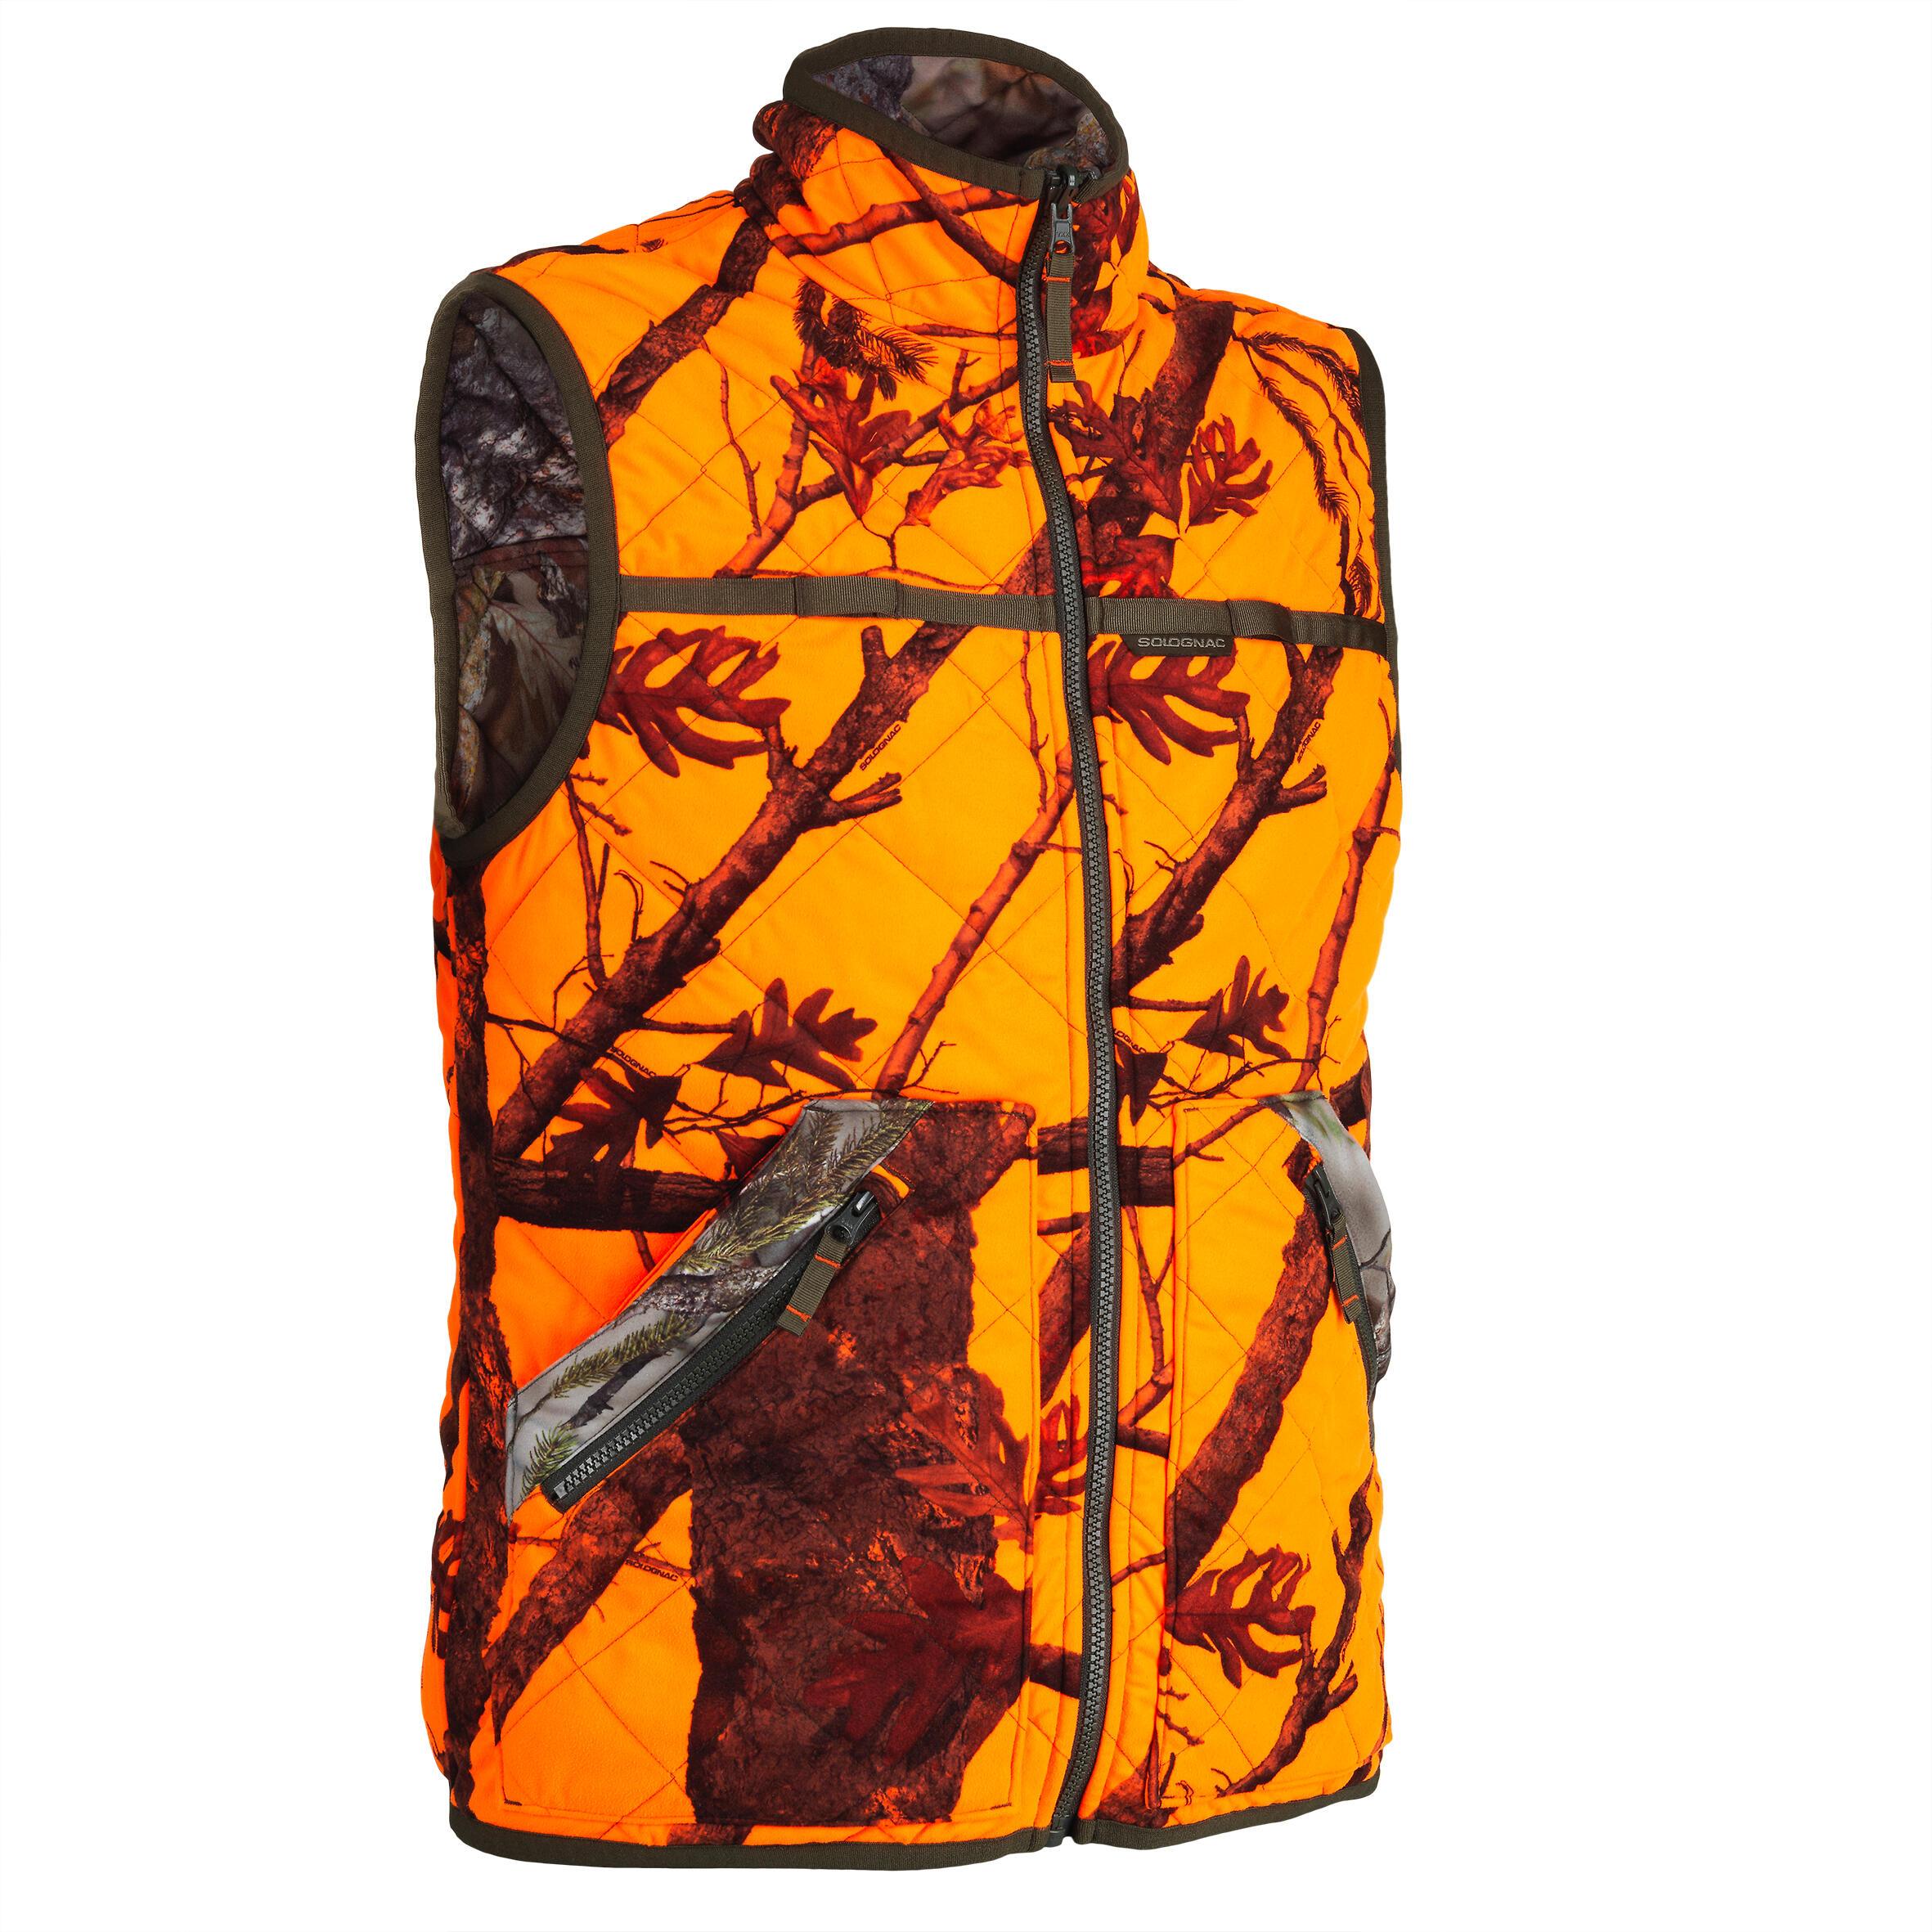 Jagdweste Camouflage wendbar orange 100 | Bekleidung > Westen > Jagdwesten | Solognac